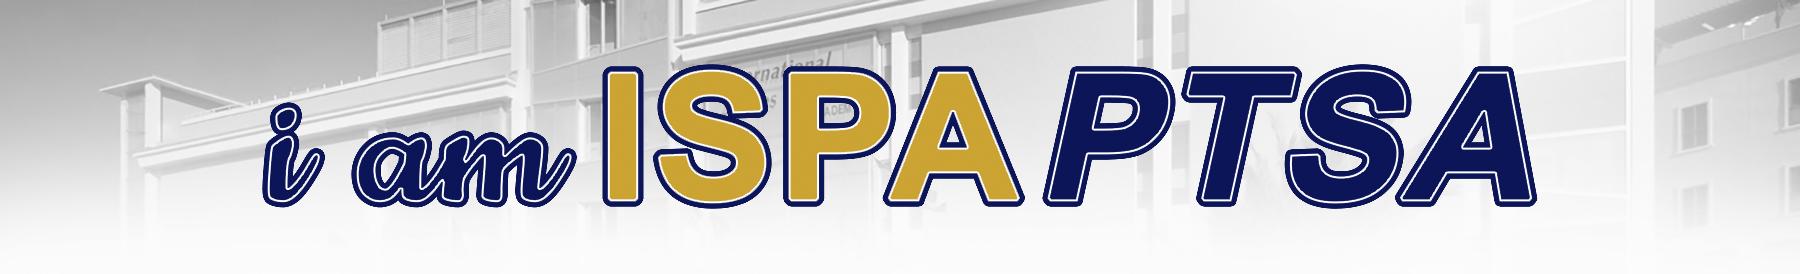 ISPA PTSA Banner